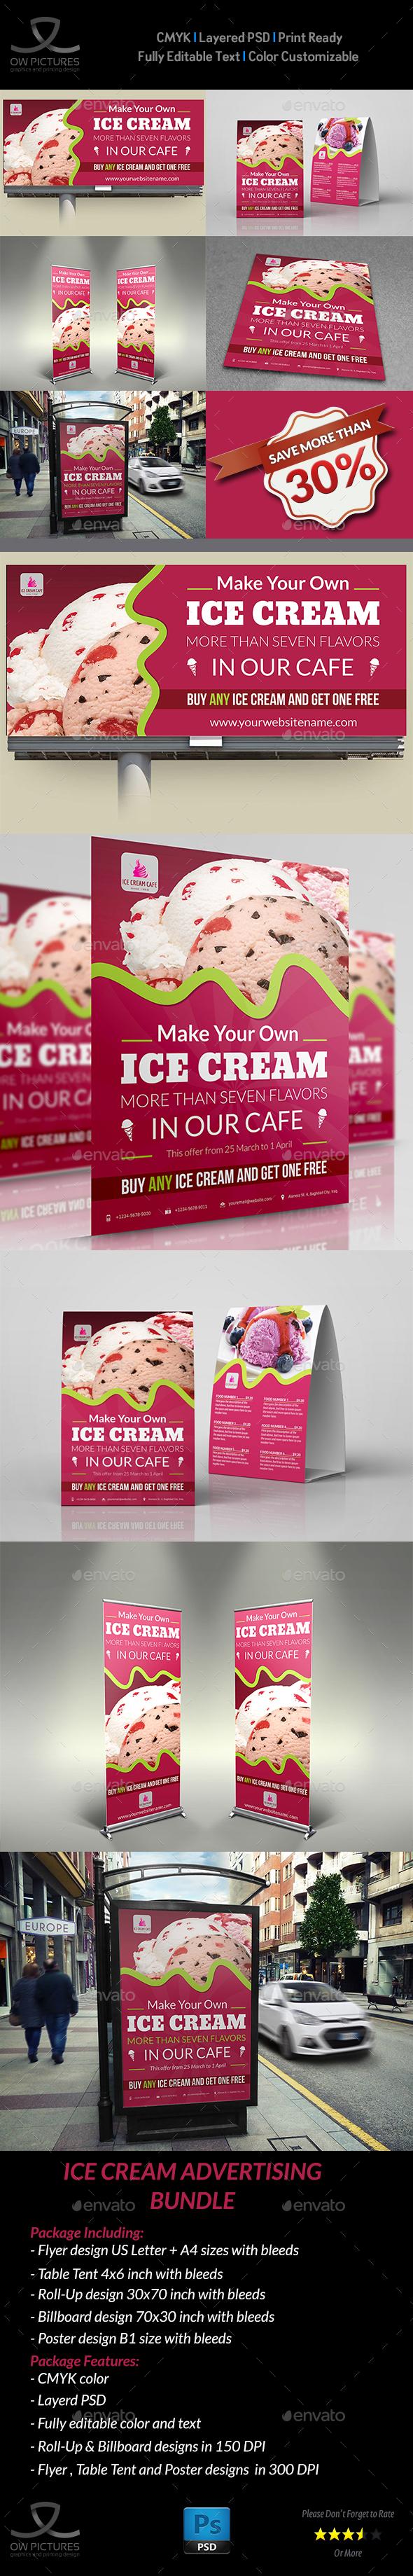 Ice Cream Advertising Bundle